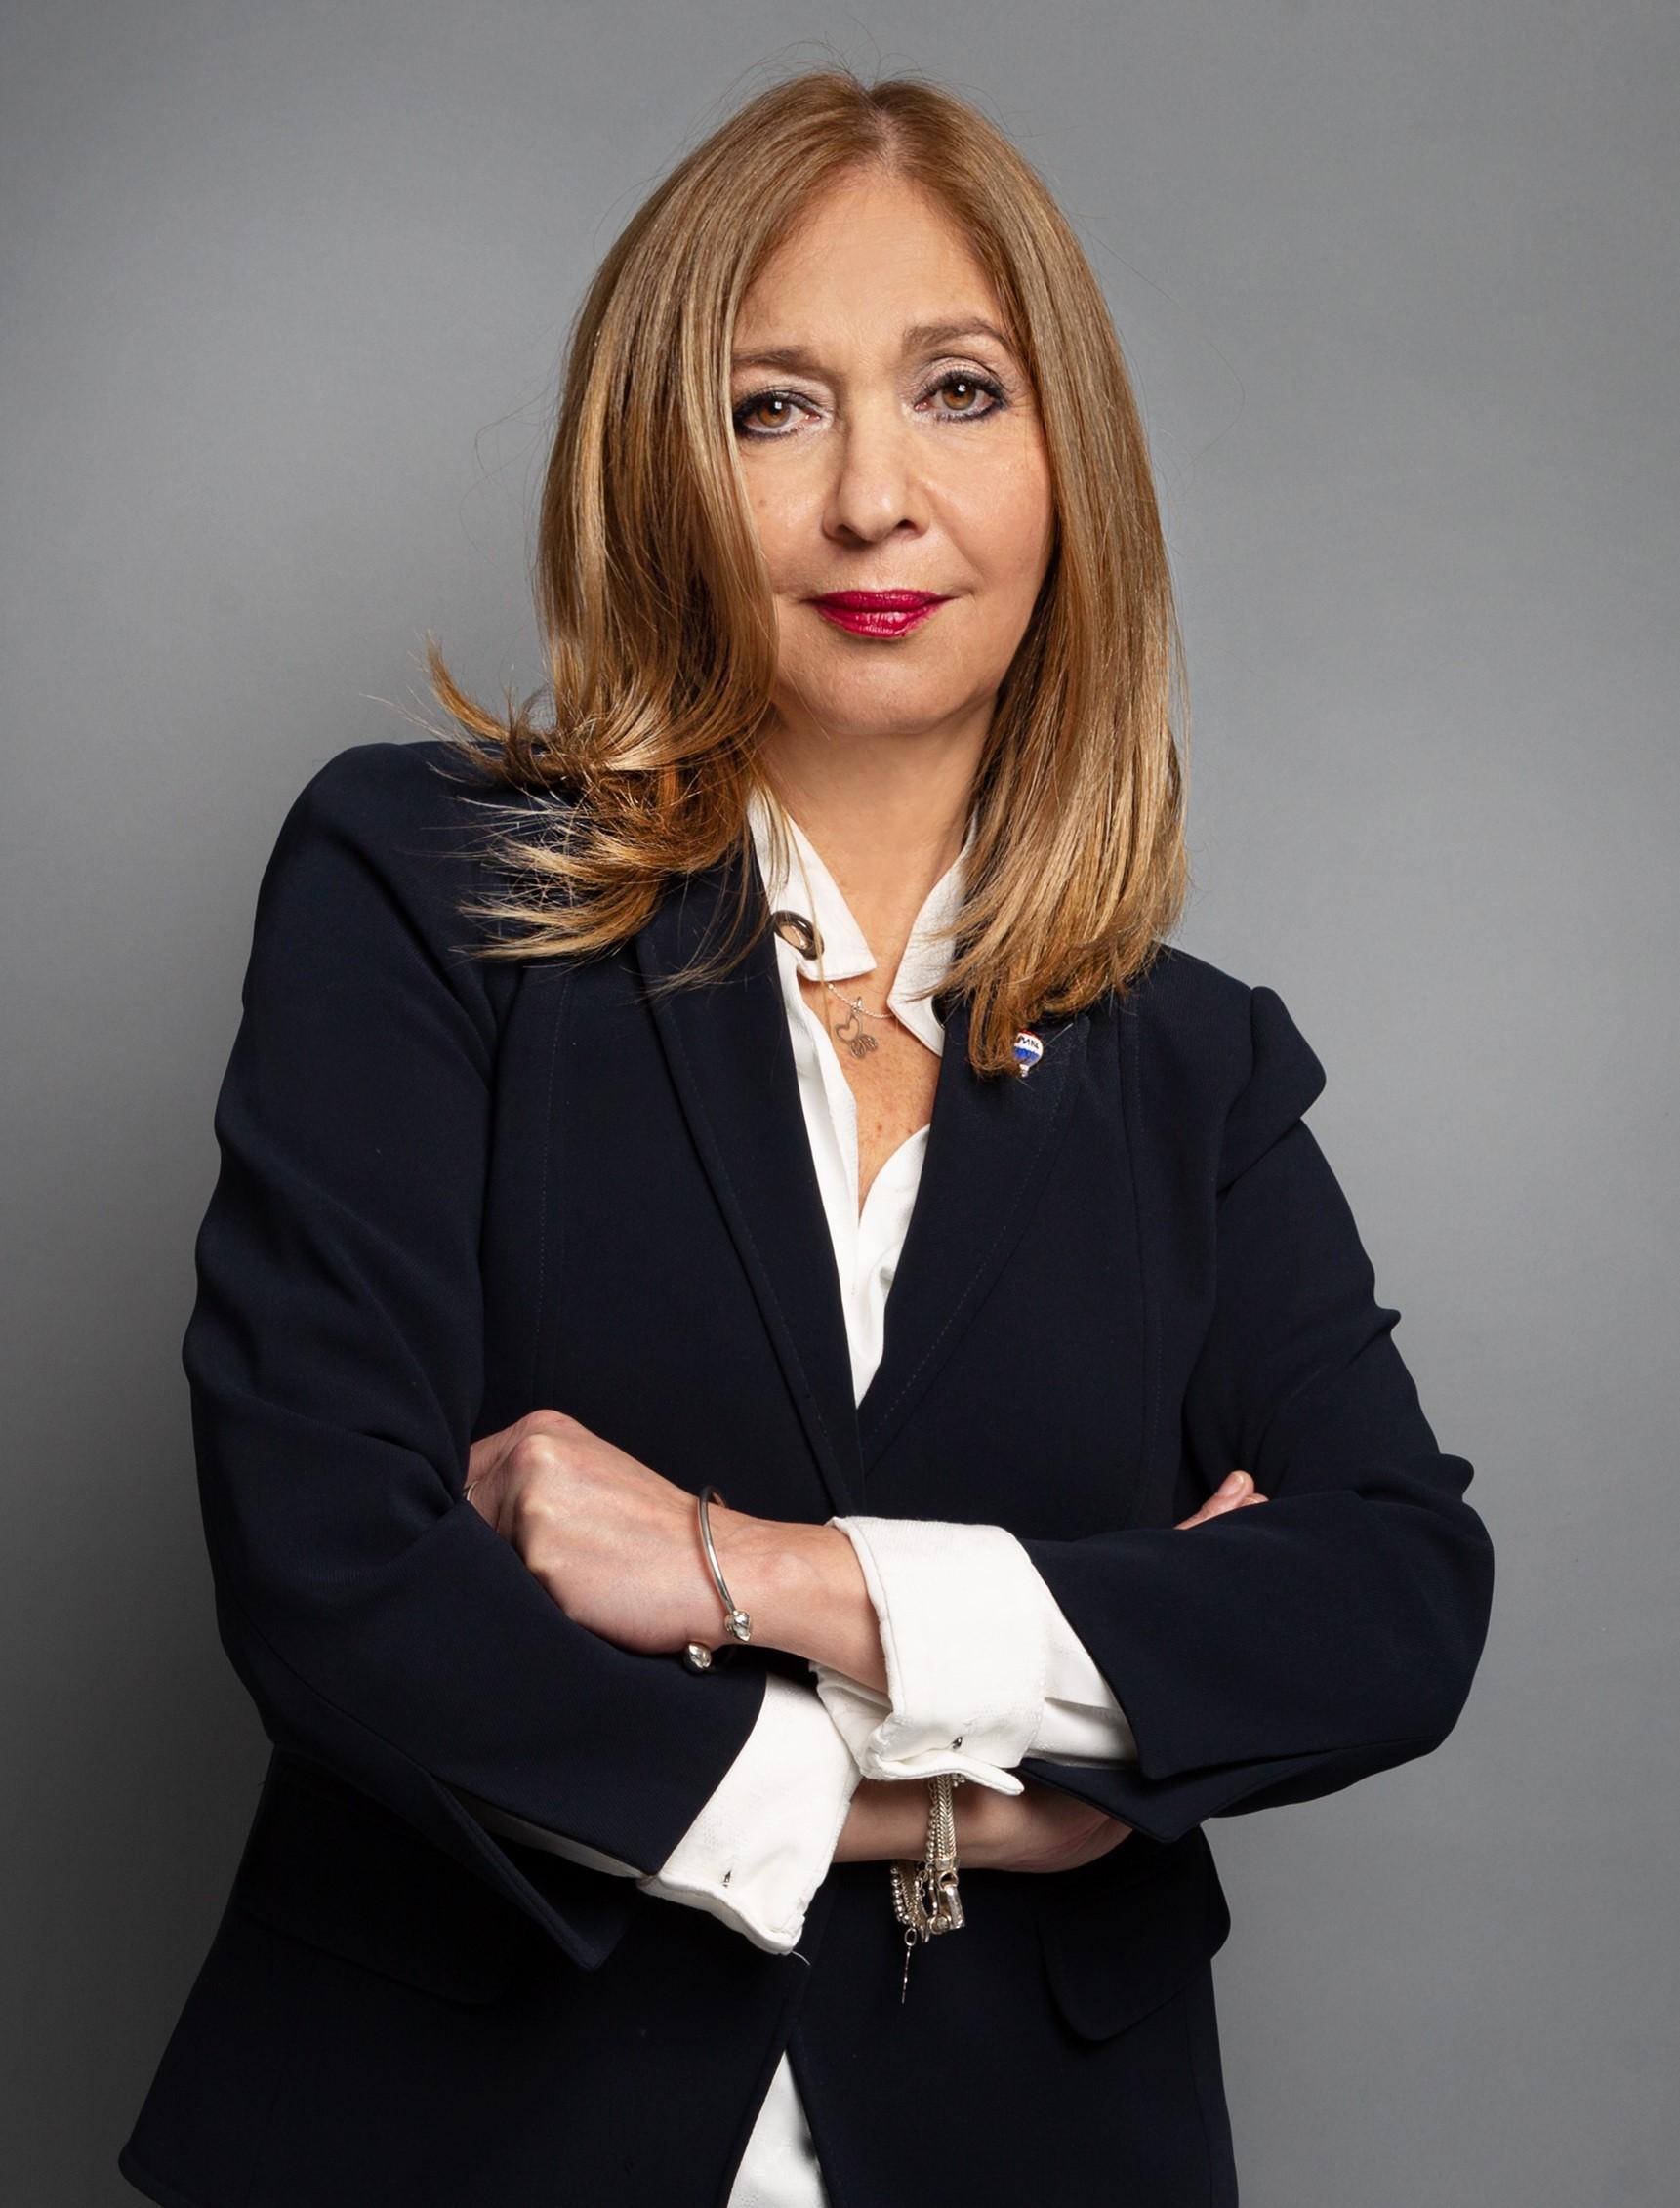 Vilma Díaz Yunis